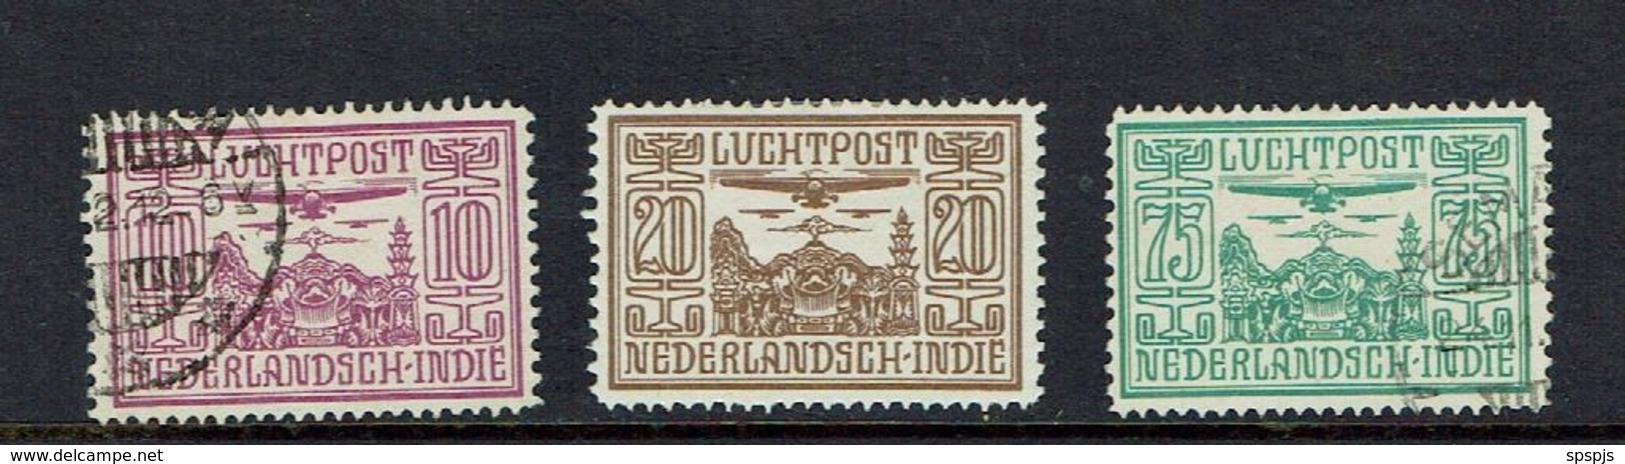 NETHERLAND INDIES....Airmail. - Indes Néerlandaises